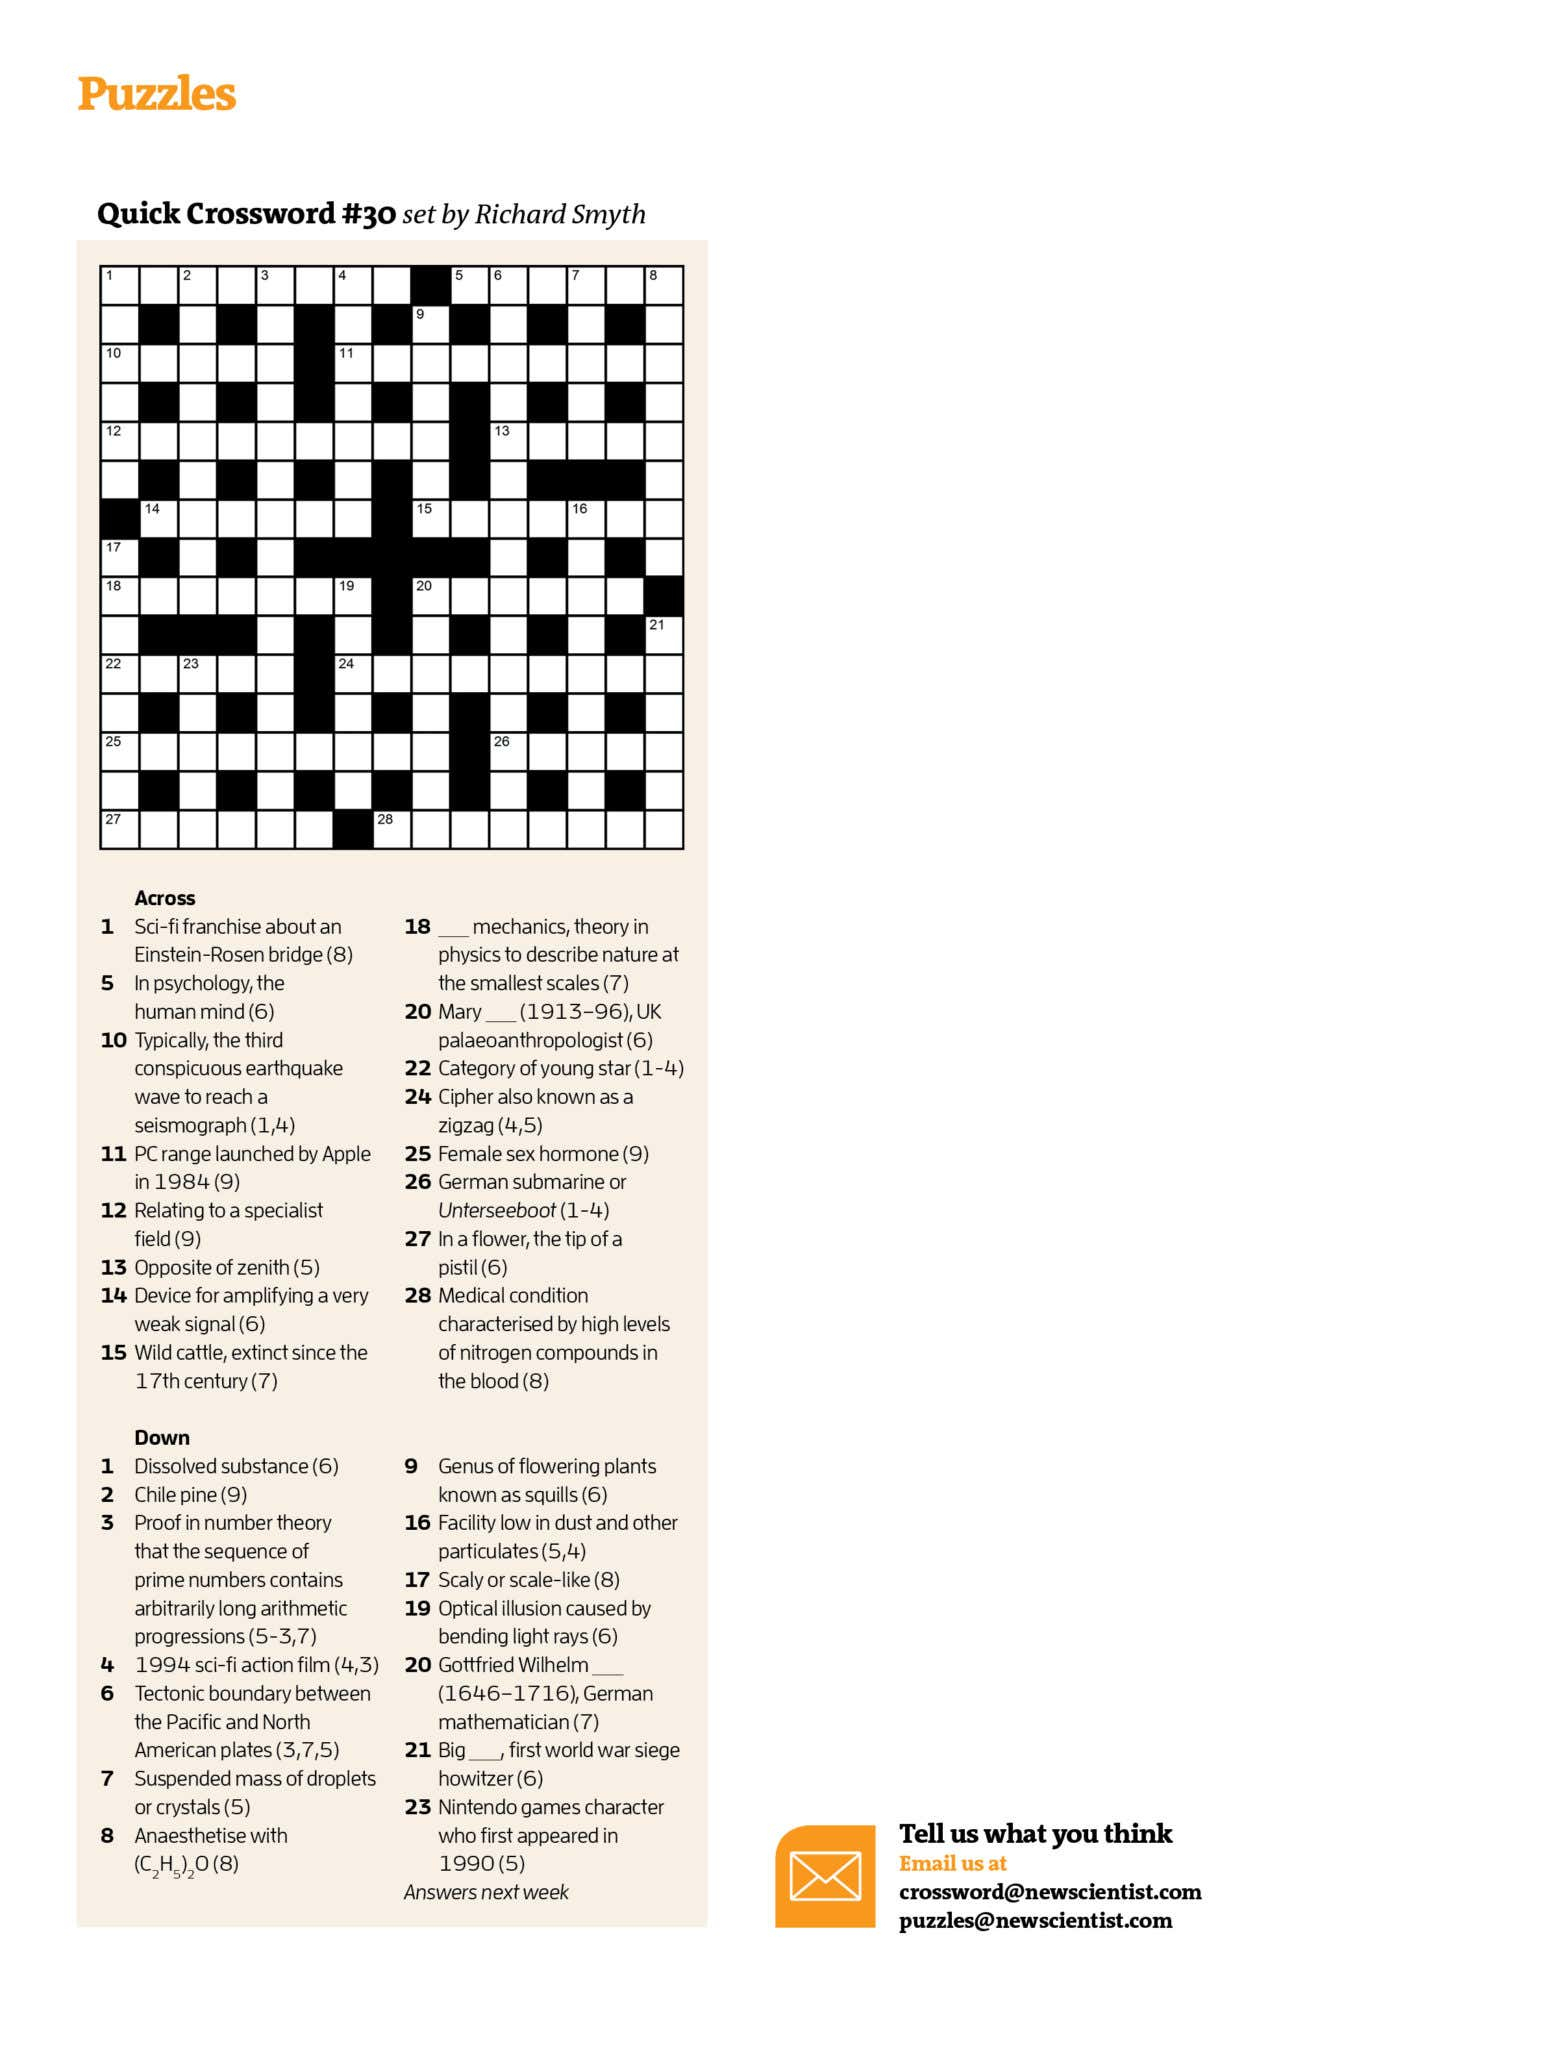 Quick Crossword #30 | New Scientist - Printable Quick Crossword Puzzles